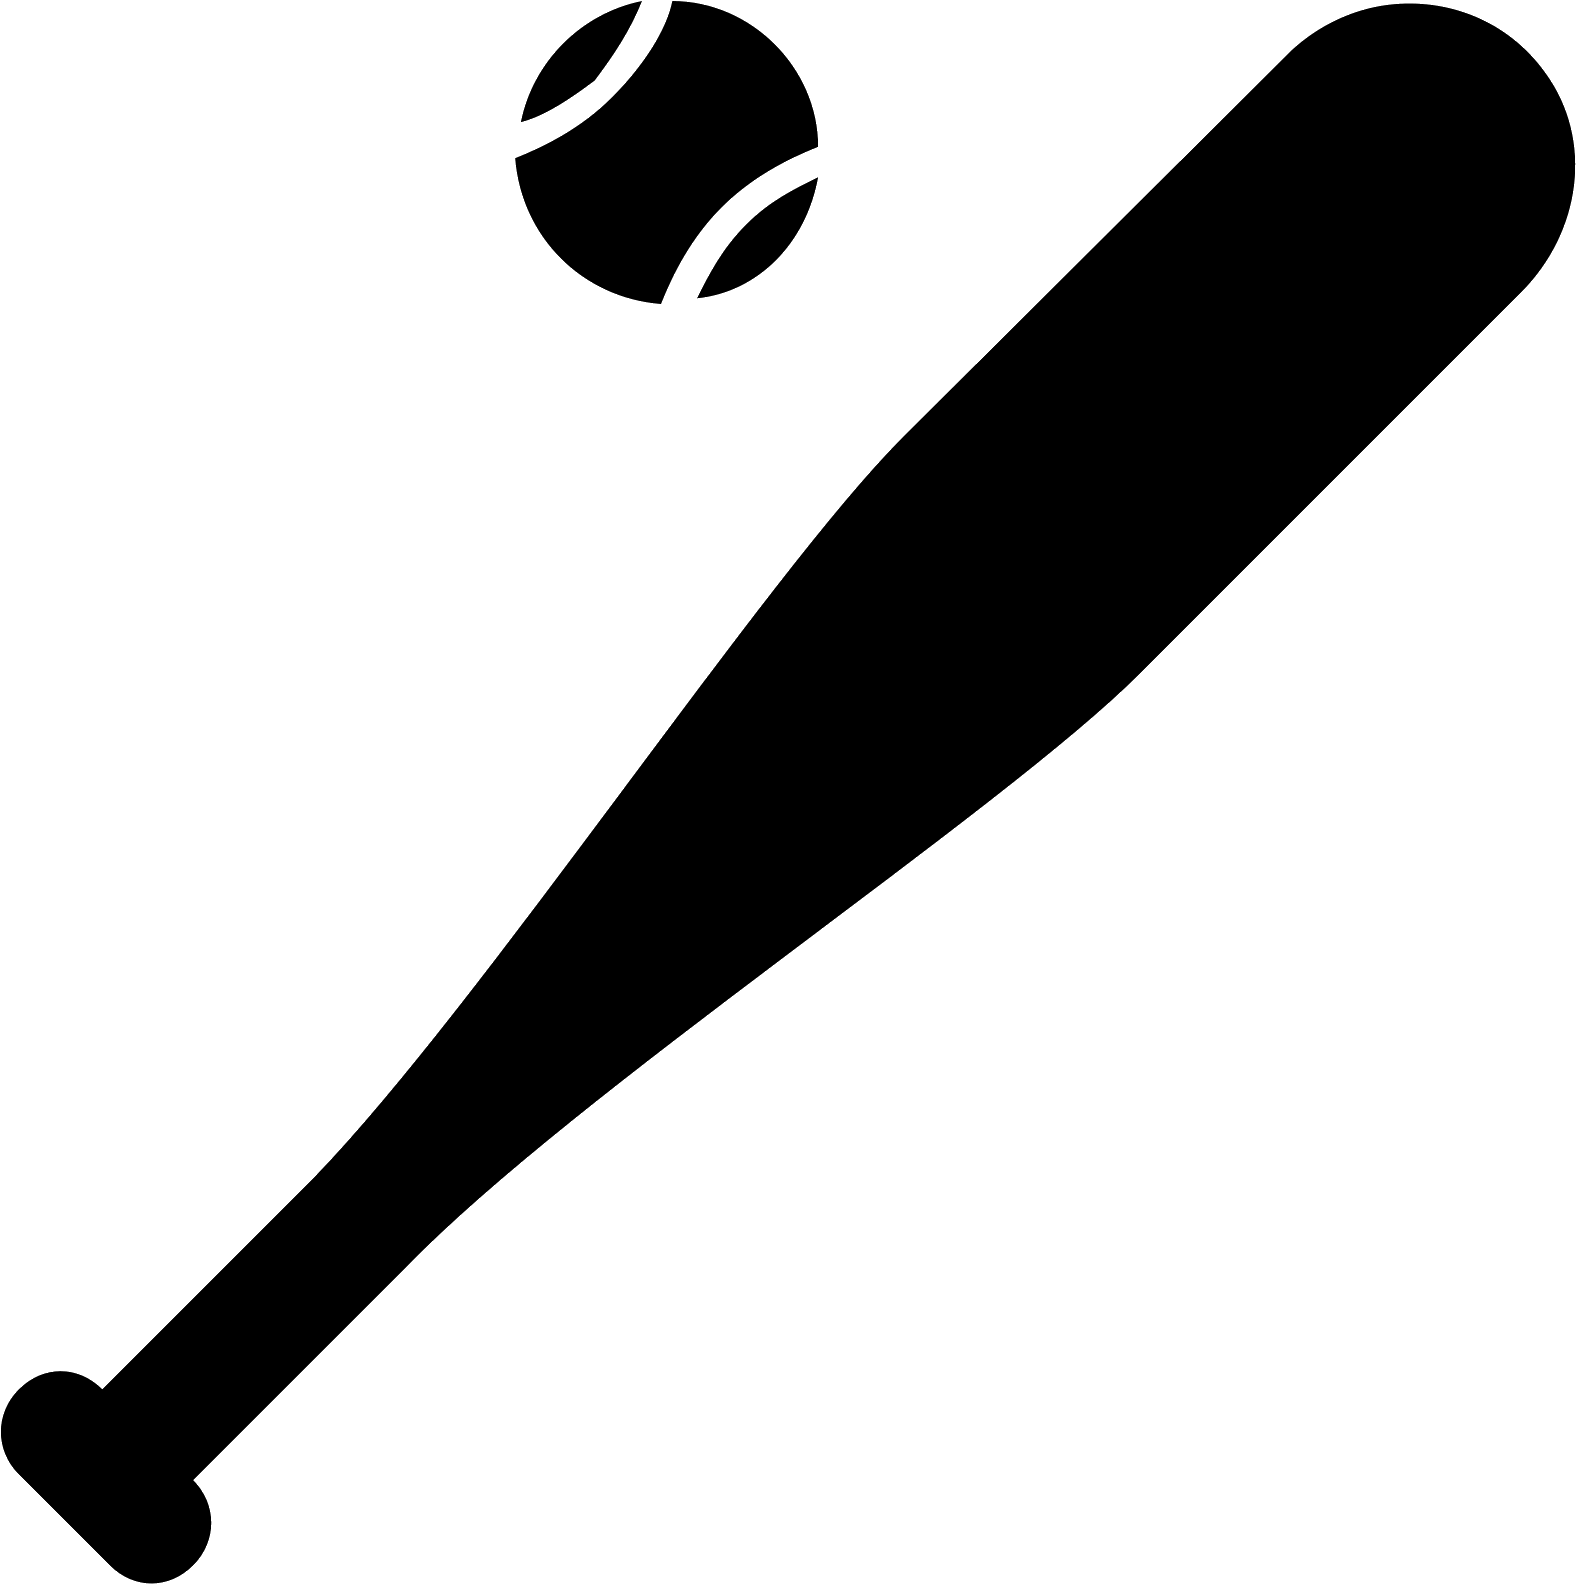 HD Black Clipart Baseball Bat.